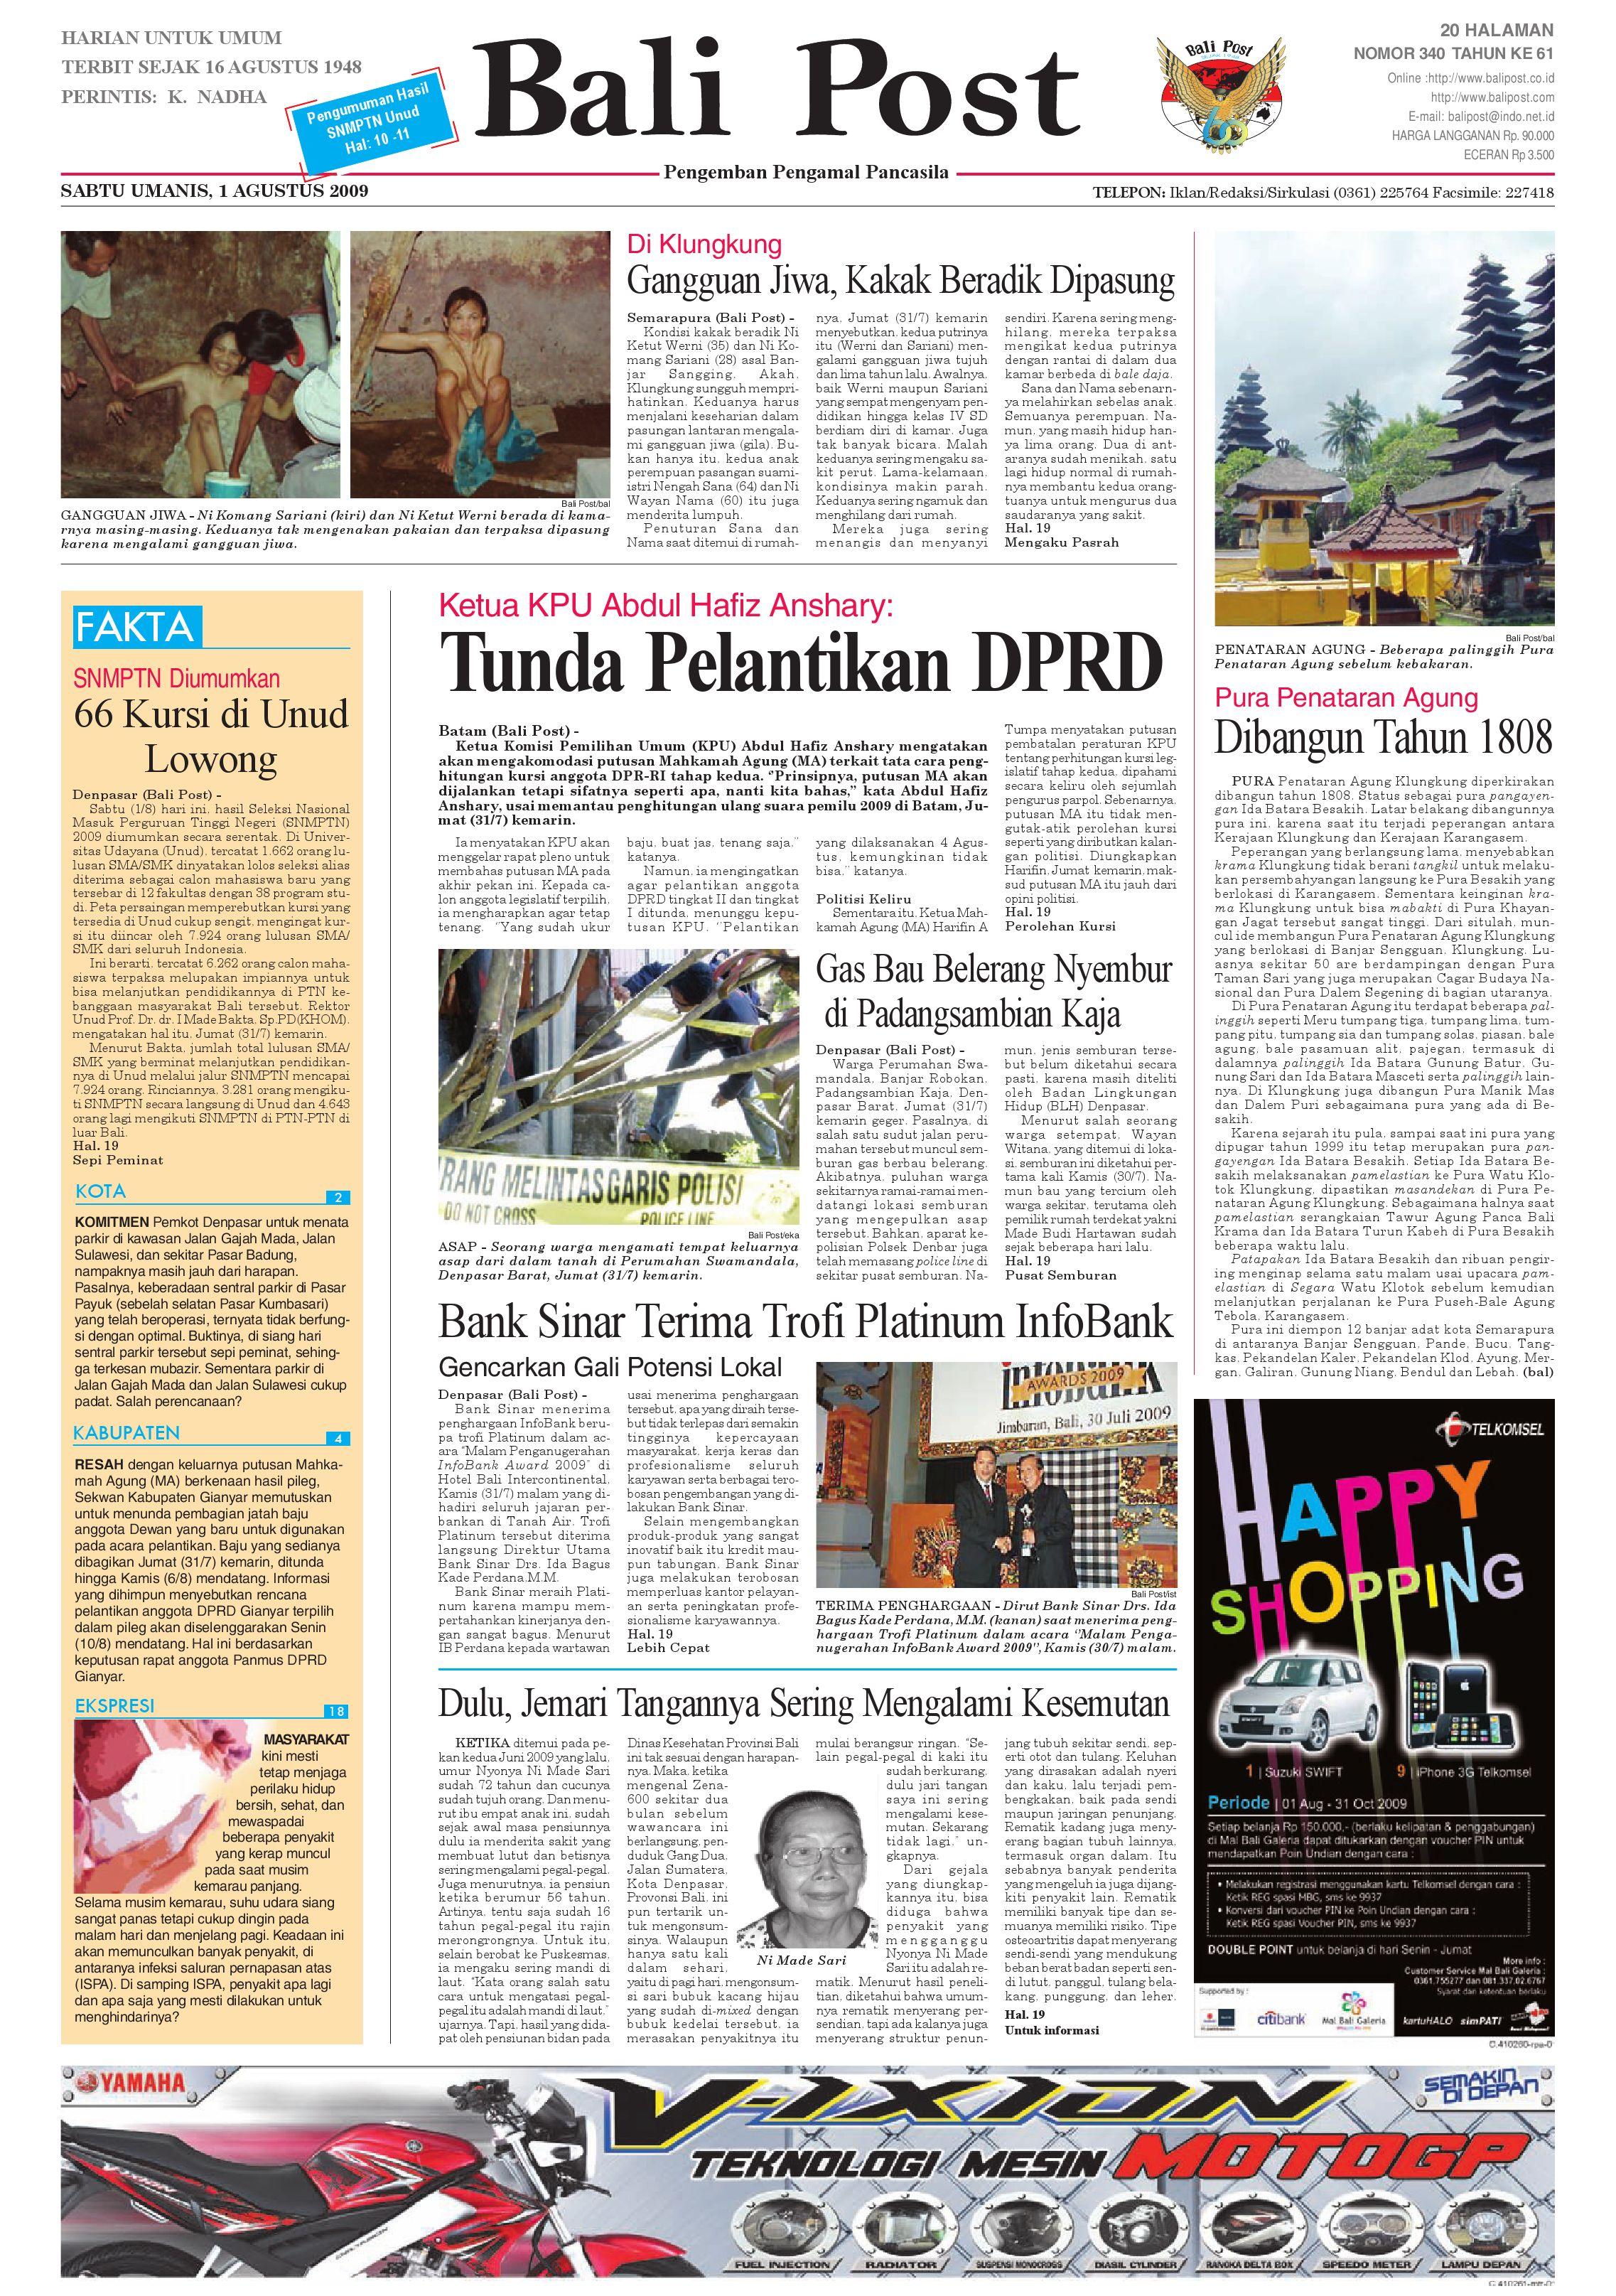 Bali Post Sabtu 01082009 By E Paper Kmb Issuu Voucher 300 Plus Tiara Gatzu Monang Maning Toko Soputan